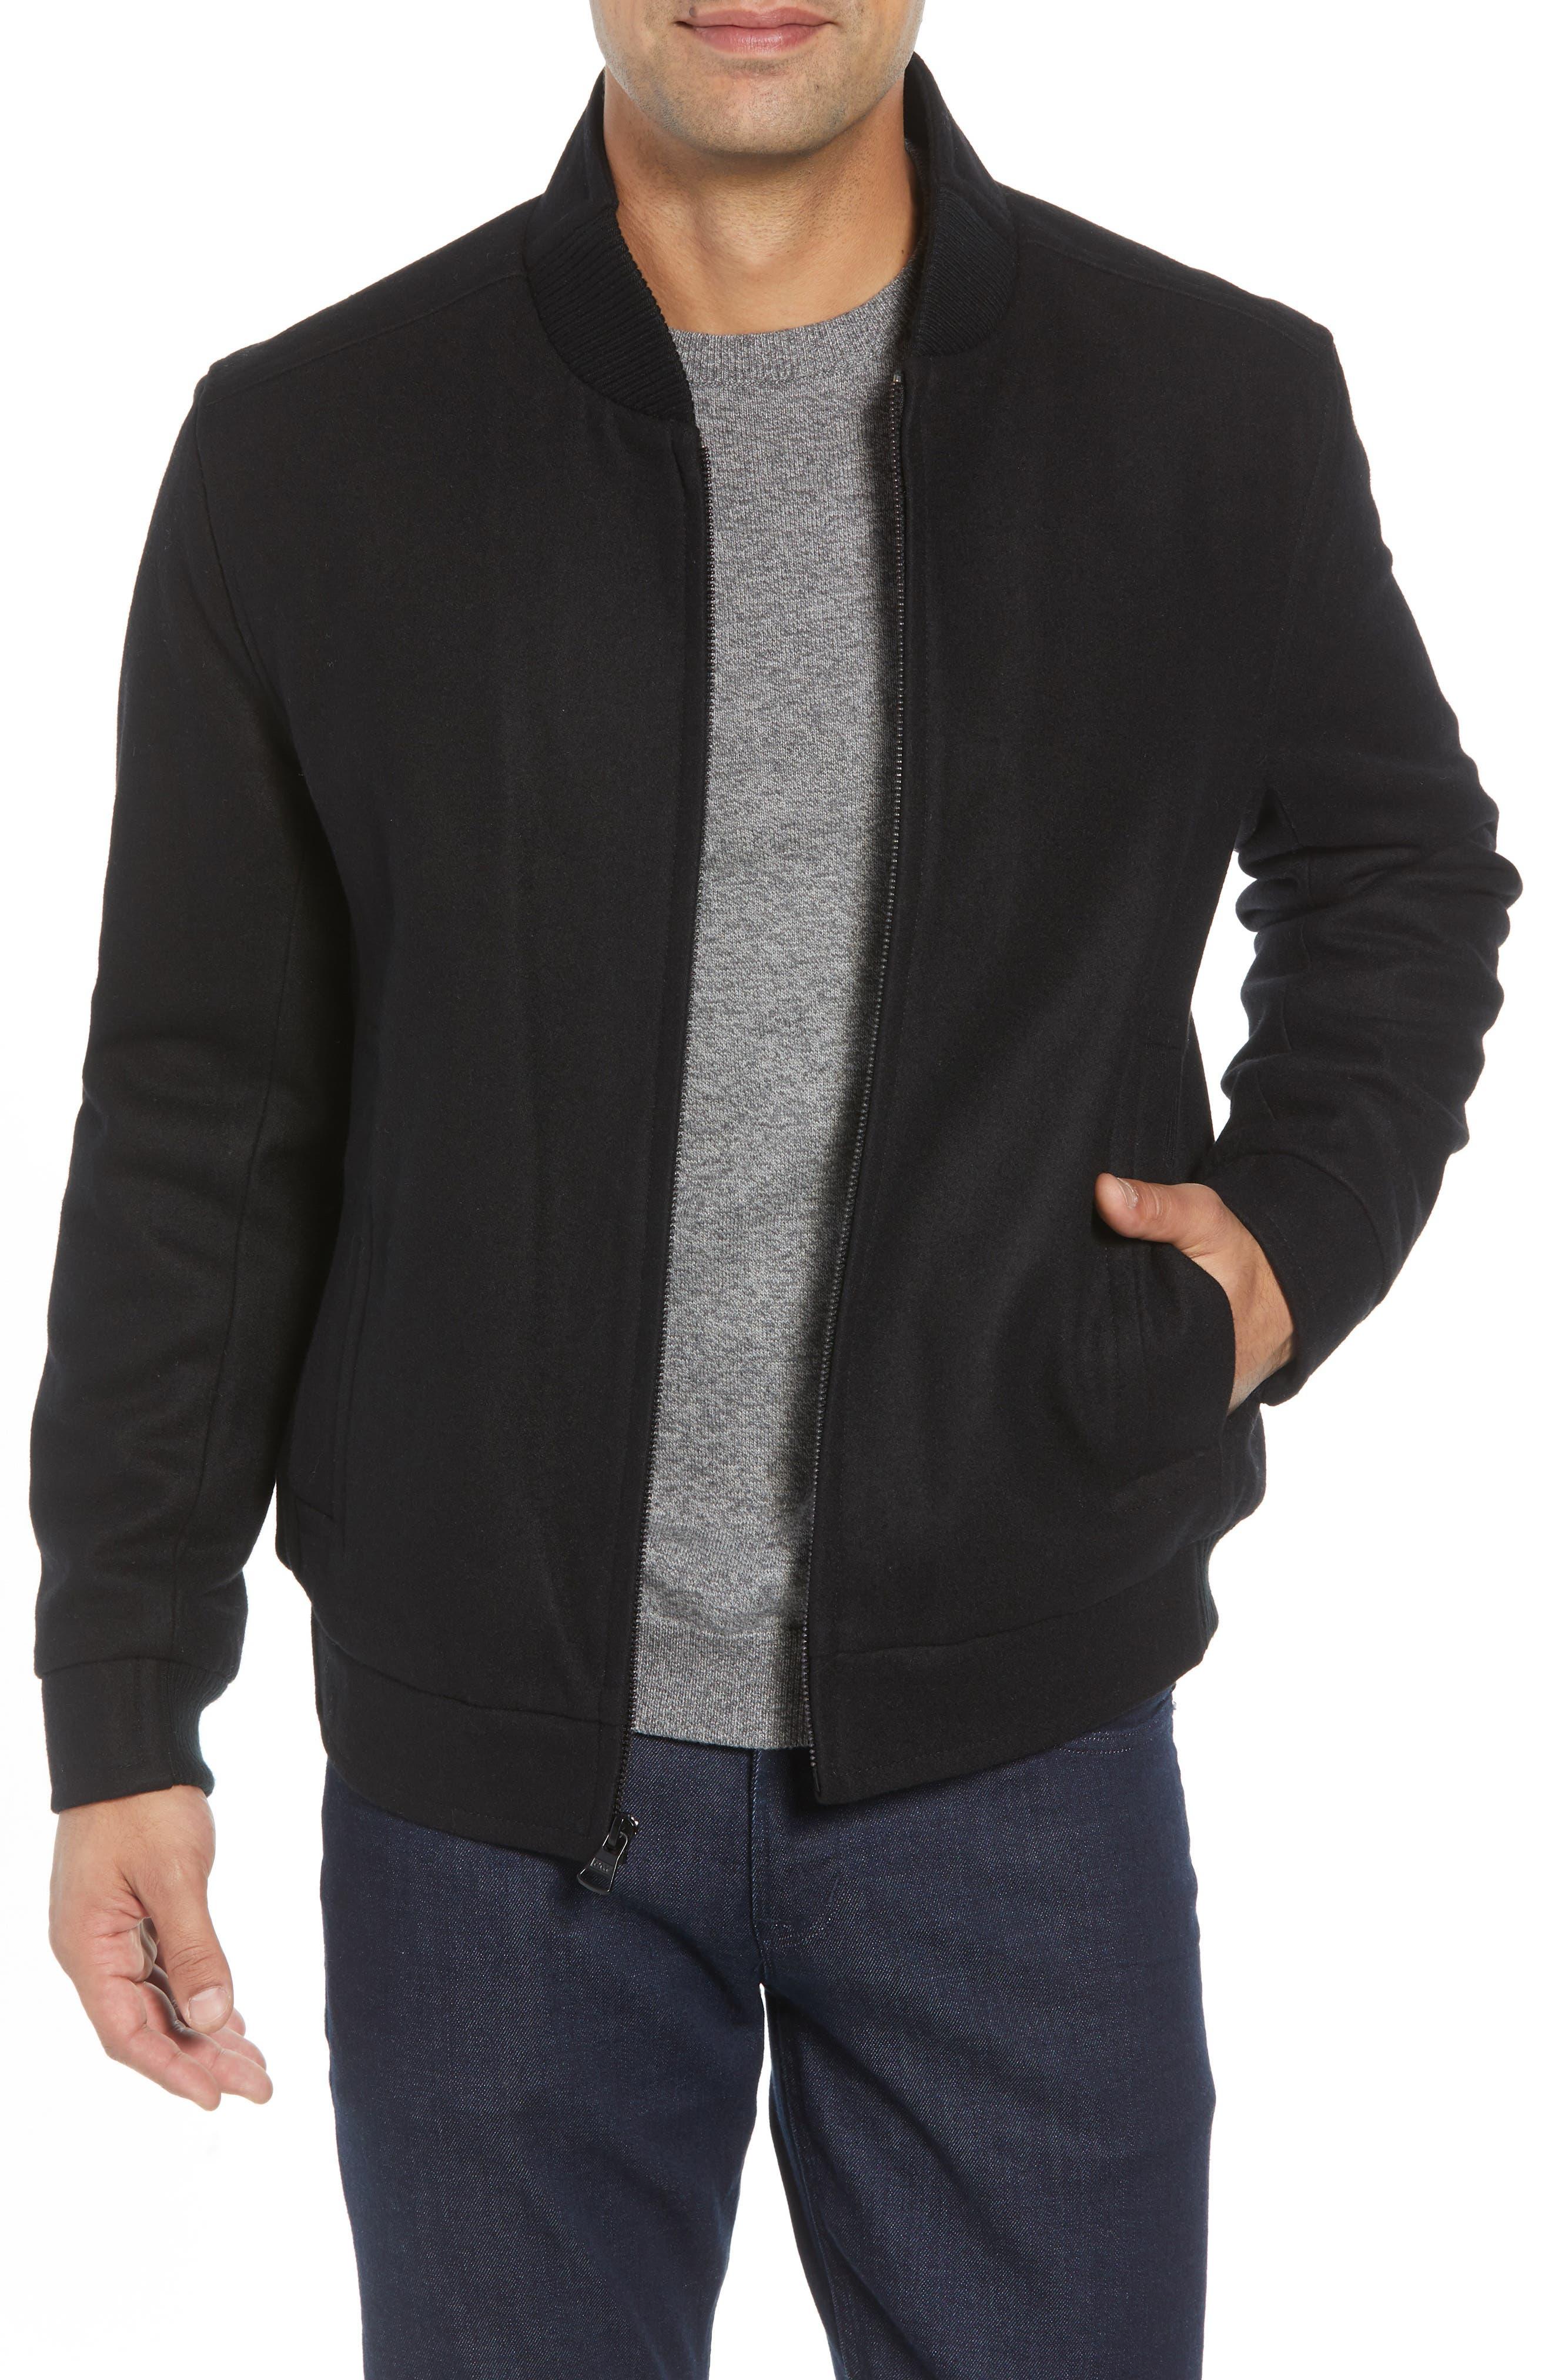 MARC NEW YORK Barlow Wool Blend Bomber Jacket, Main, color, 001